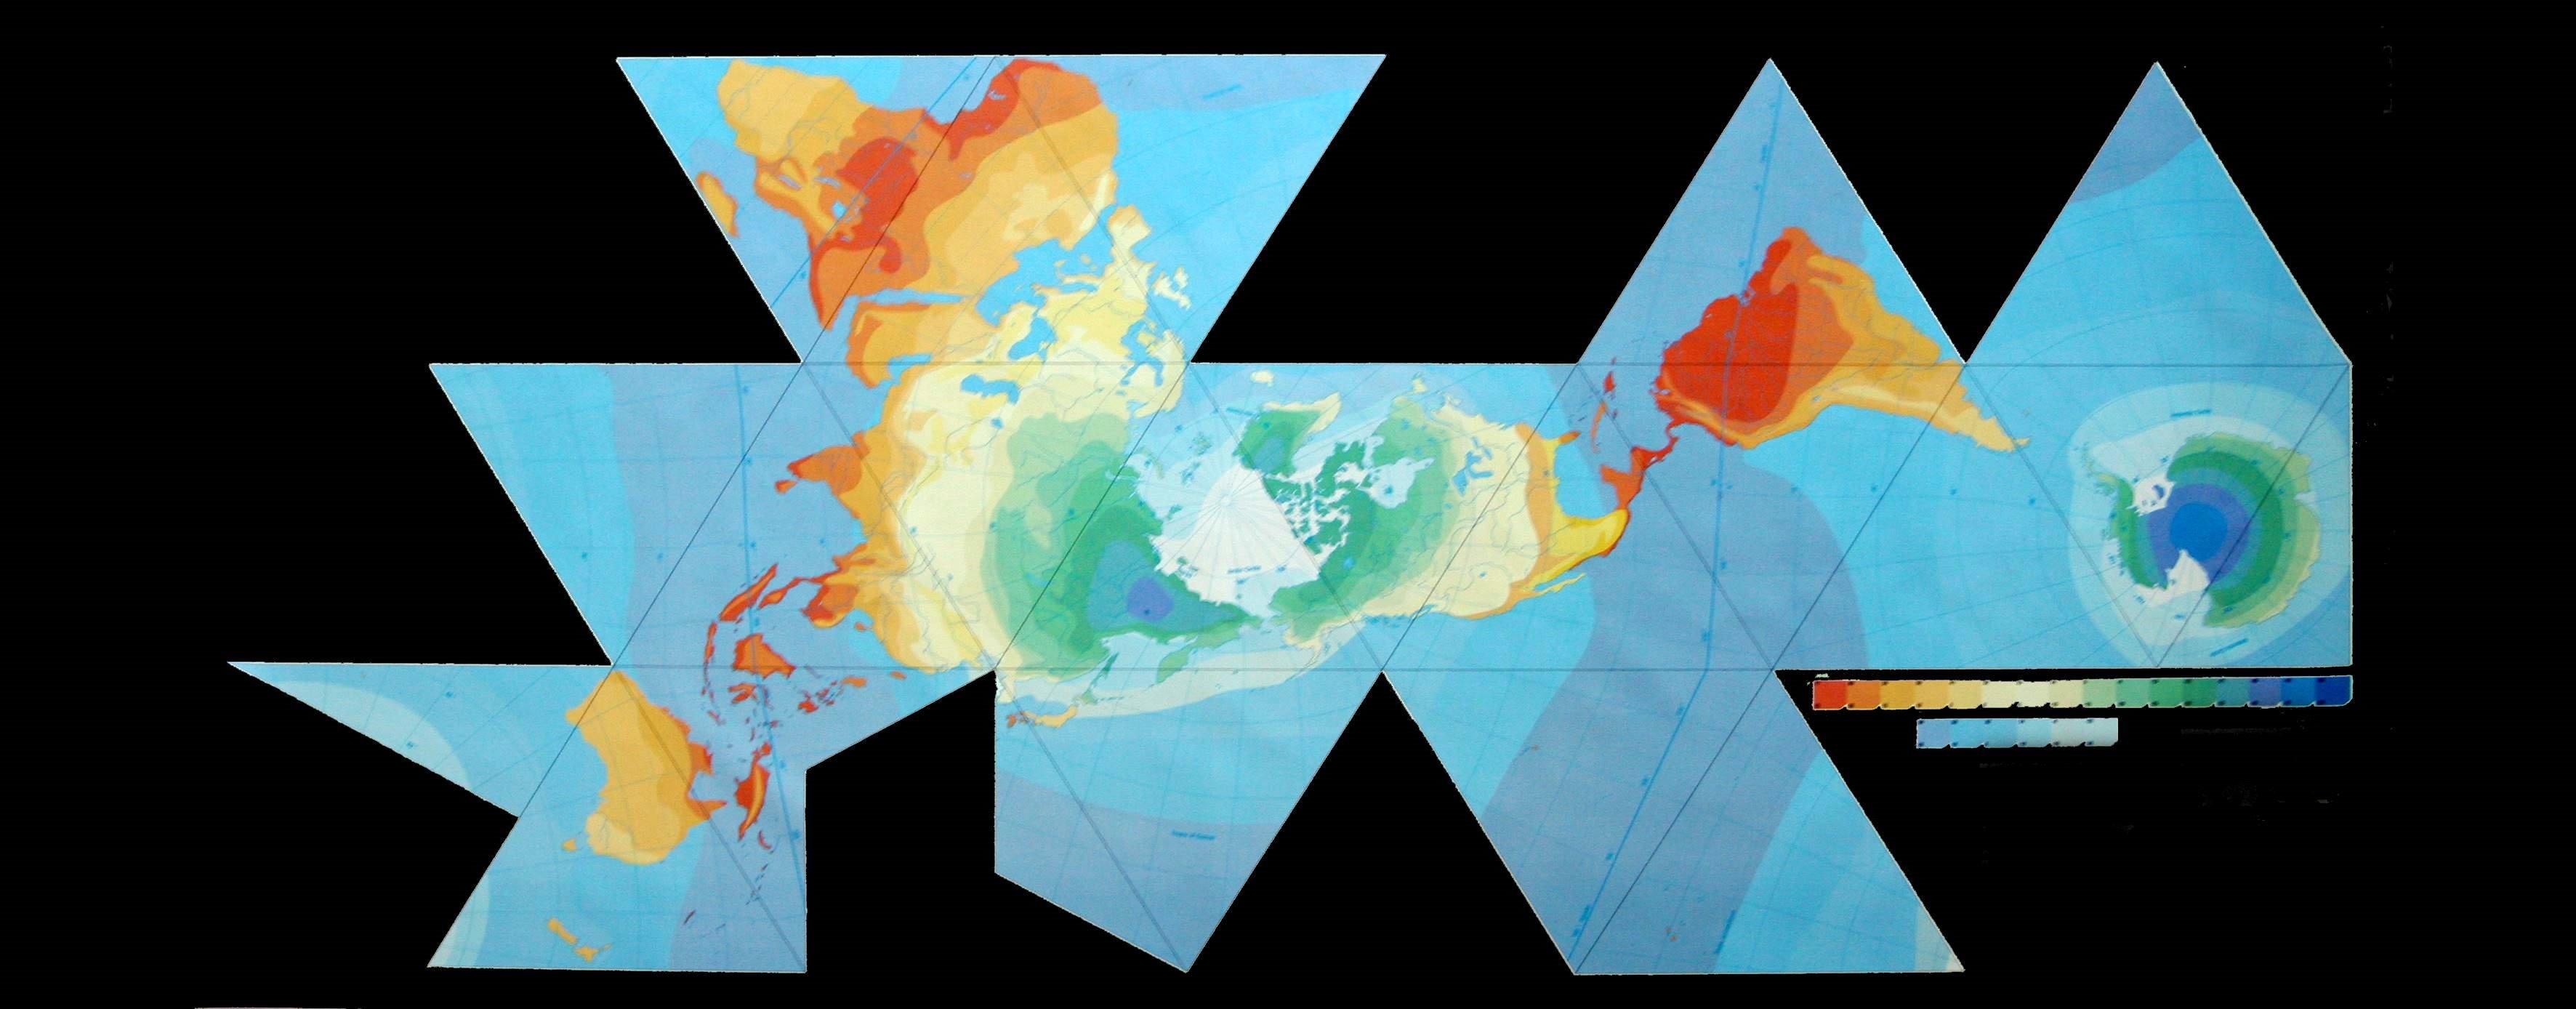 via Gene Keyes; Cahill-Keyes Maps